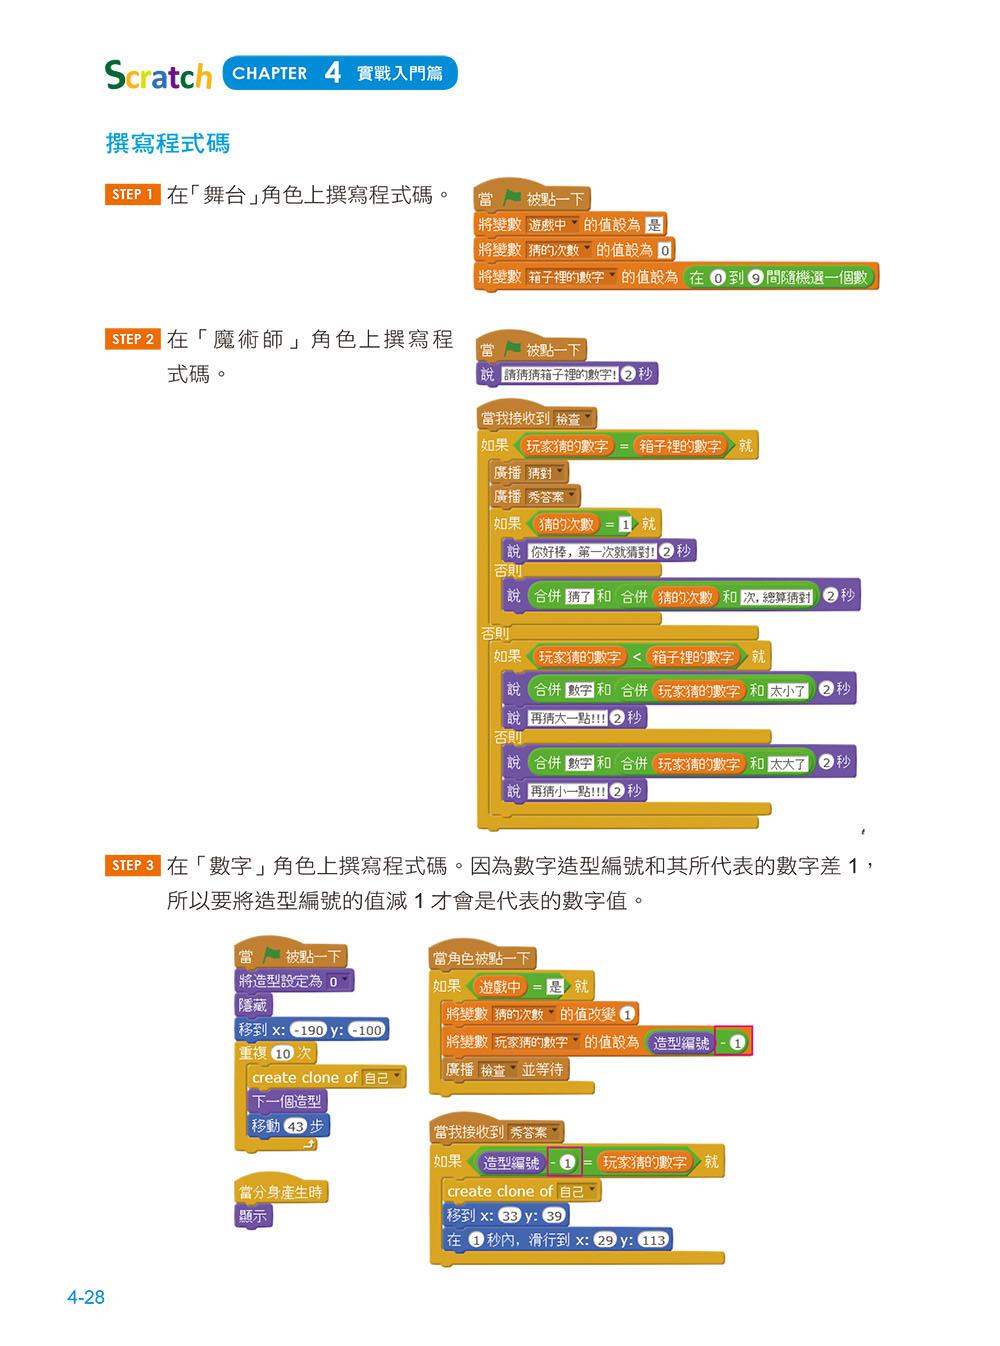 http://im1.book.com.tw/image/getImage?i=http://www.books.com.tw/img/001/070/34/0010703424_b_04.jpg&v=5694f1dd&w=655&h=609